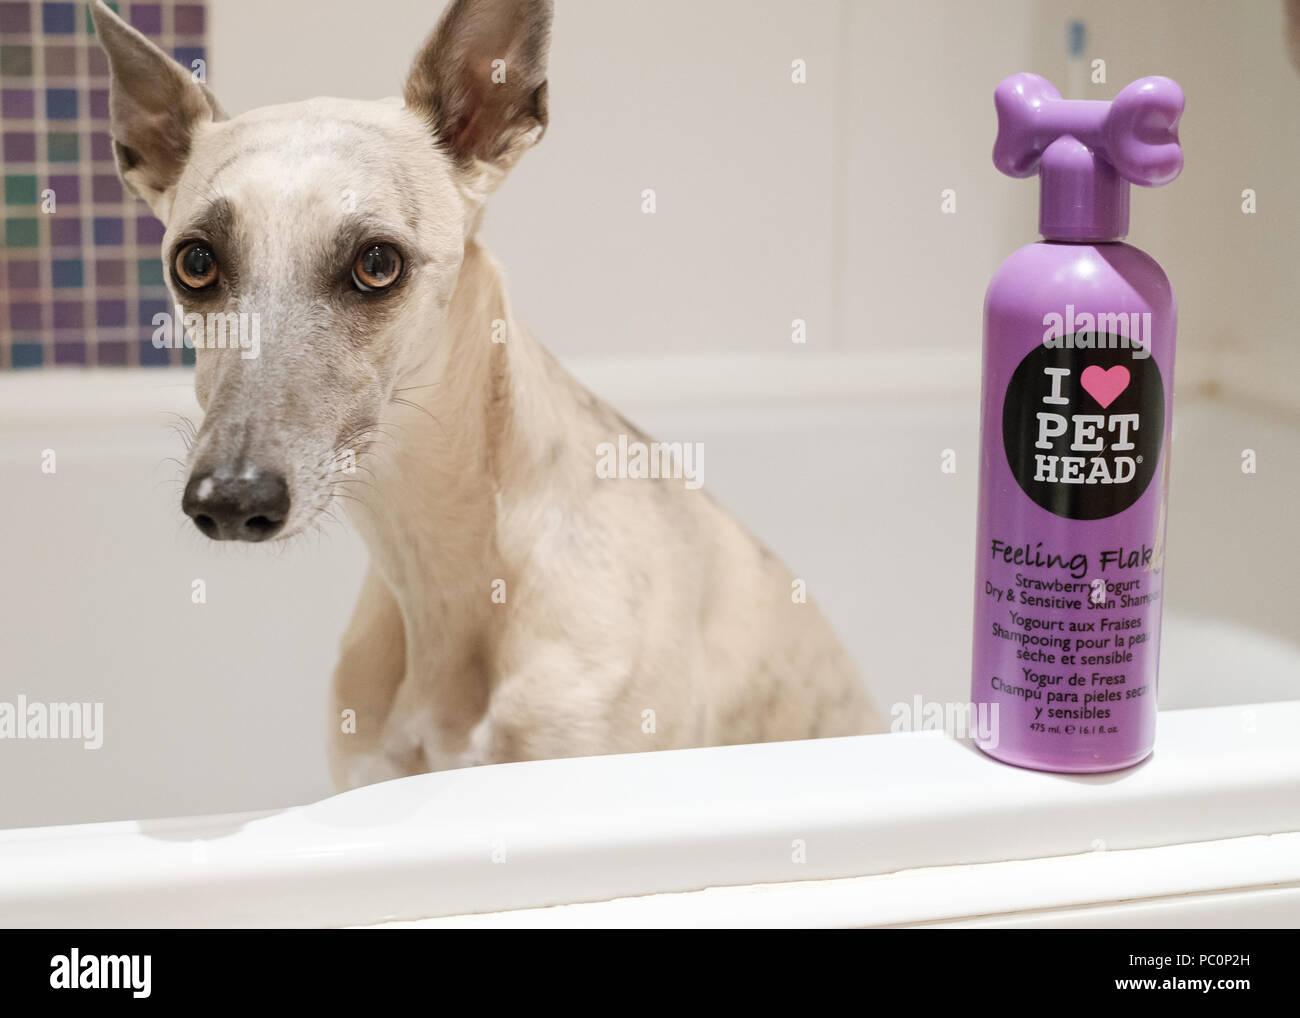 Brindle whippet dog in bath with bottle of dog shampoo Stock Photo